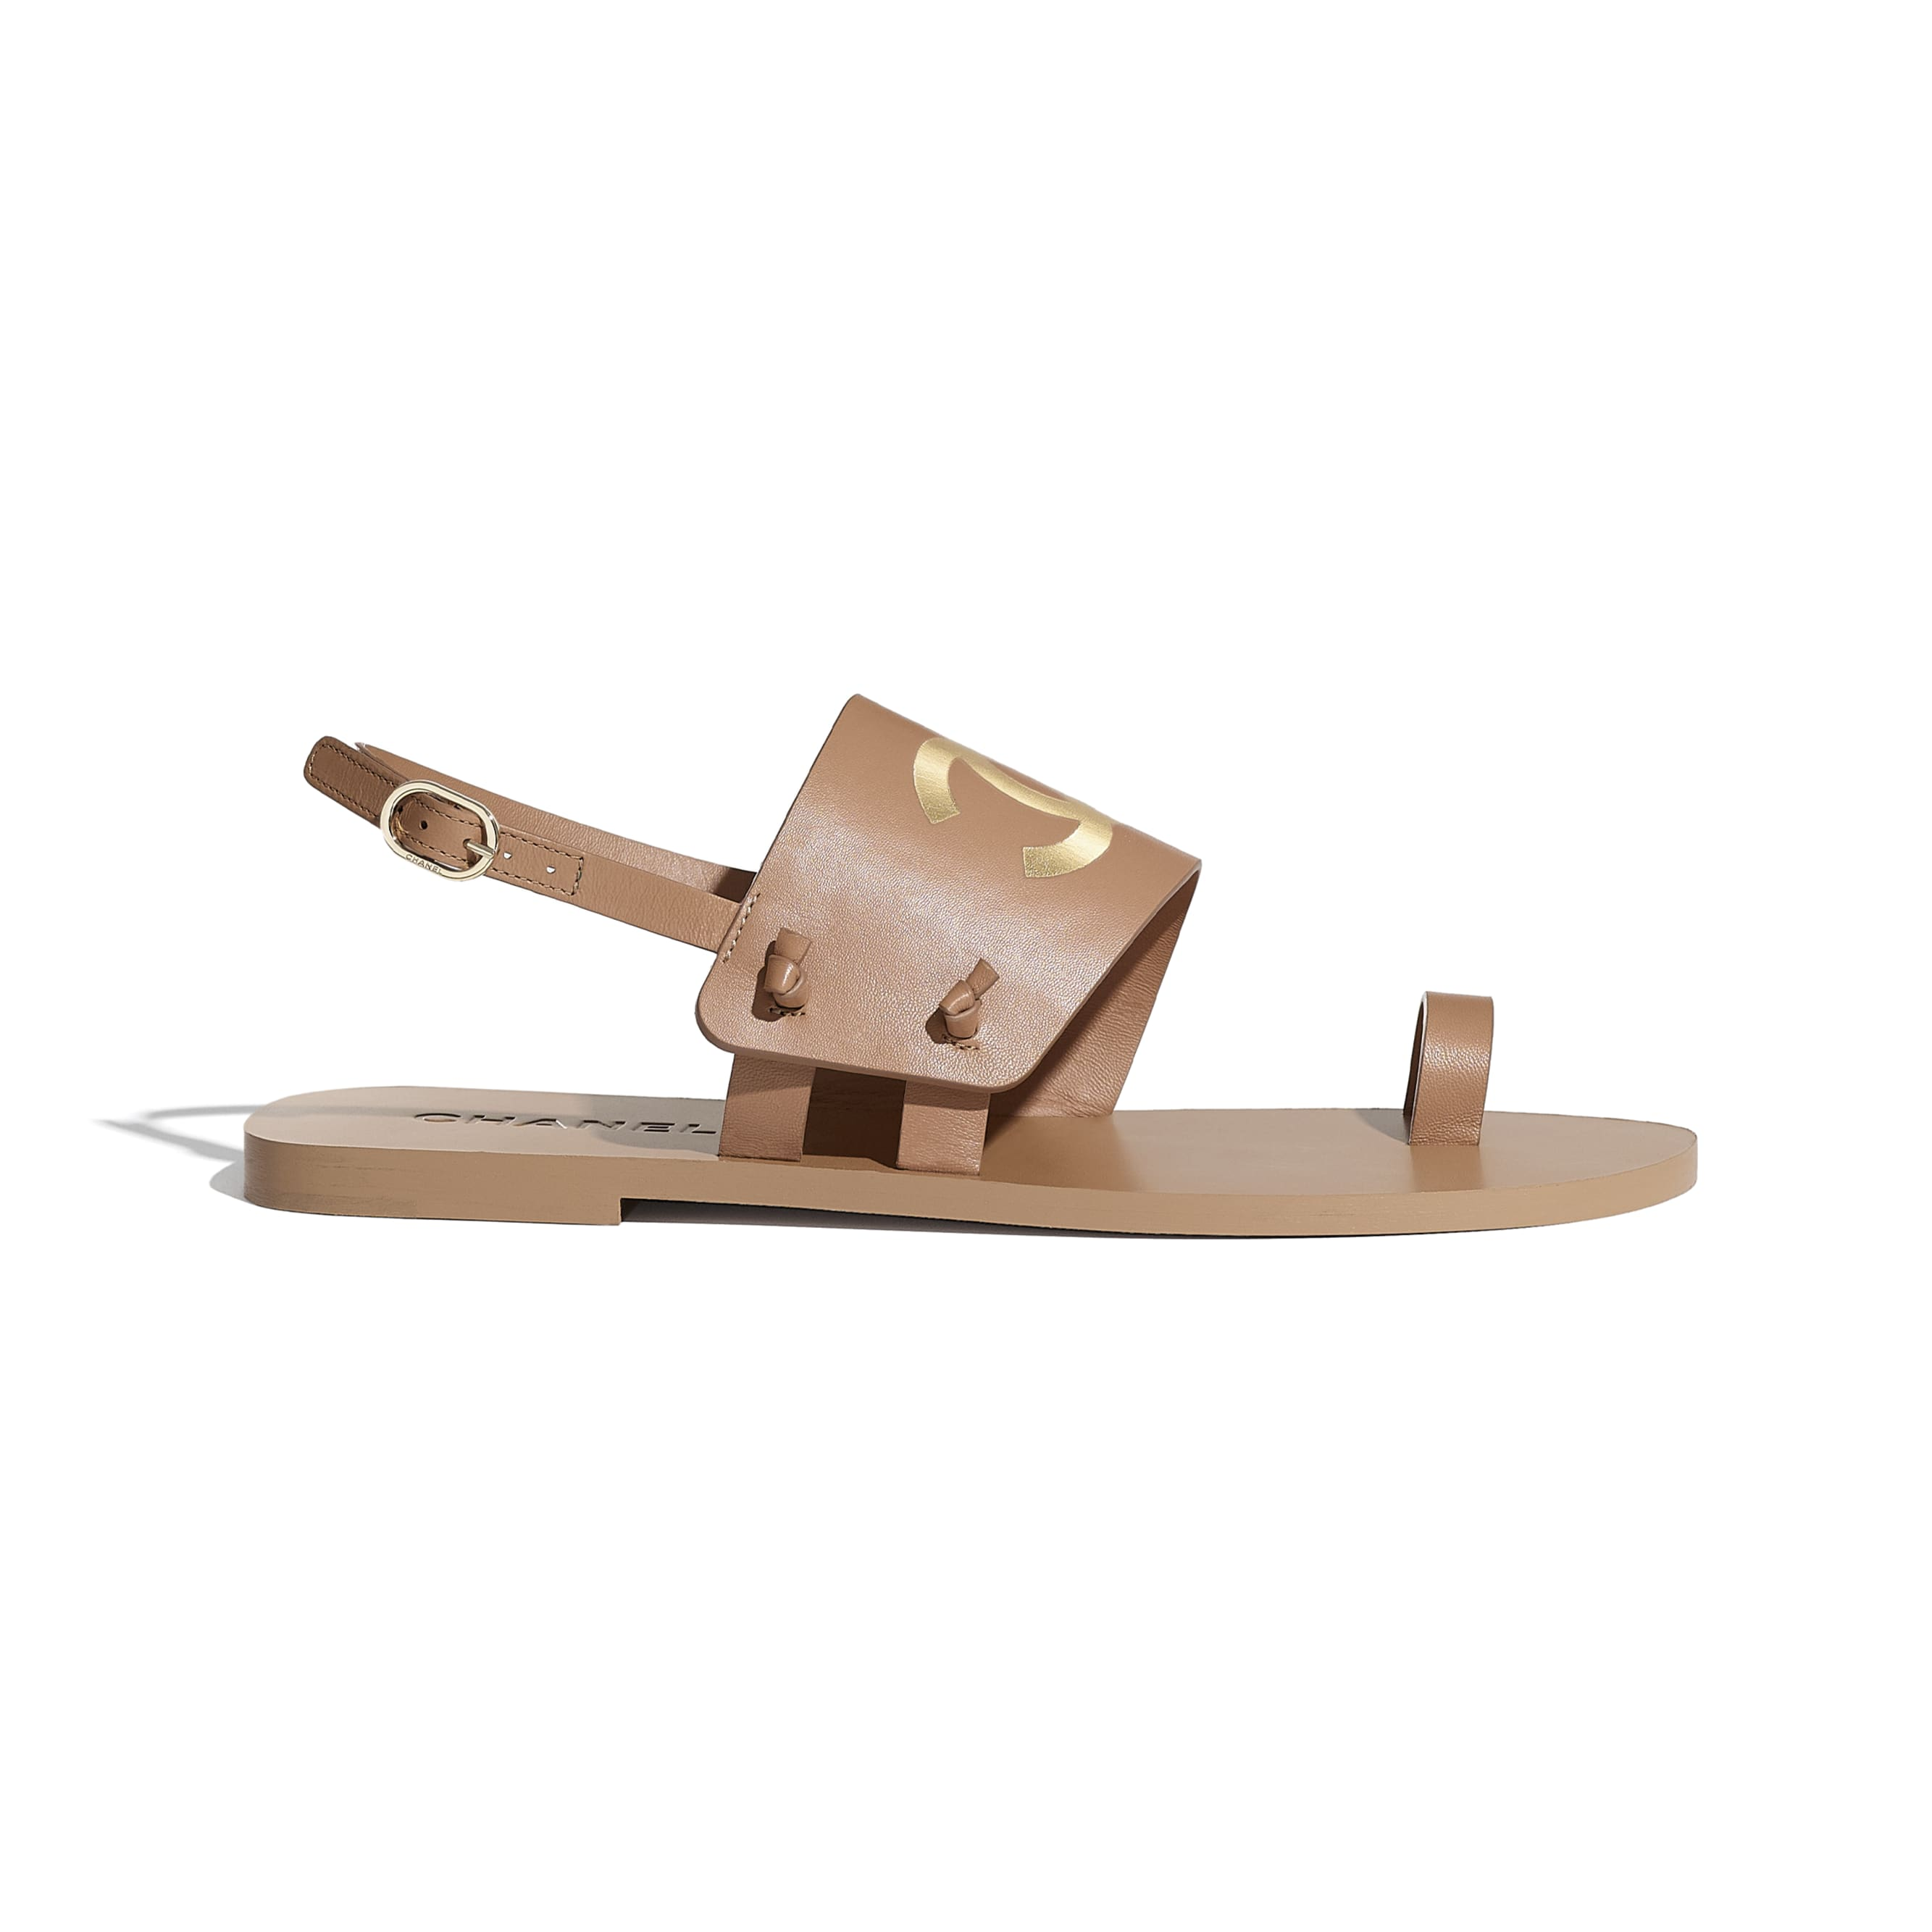 Sandals - Brown - Goatskin - CHANEL - Default view - see standard sized version